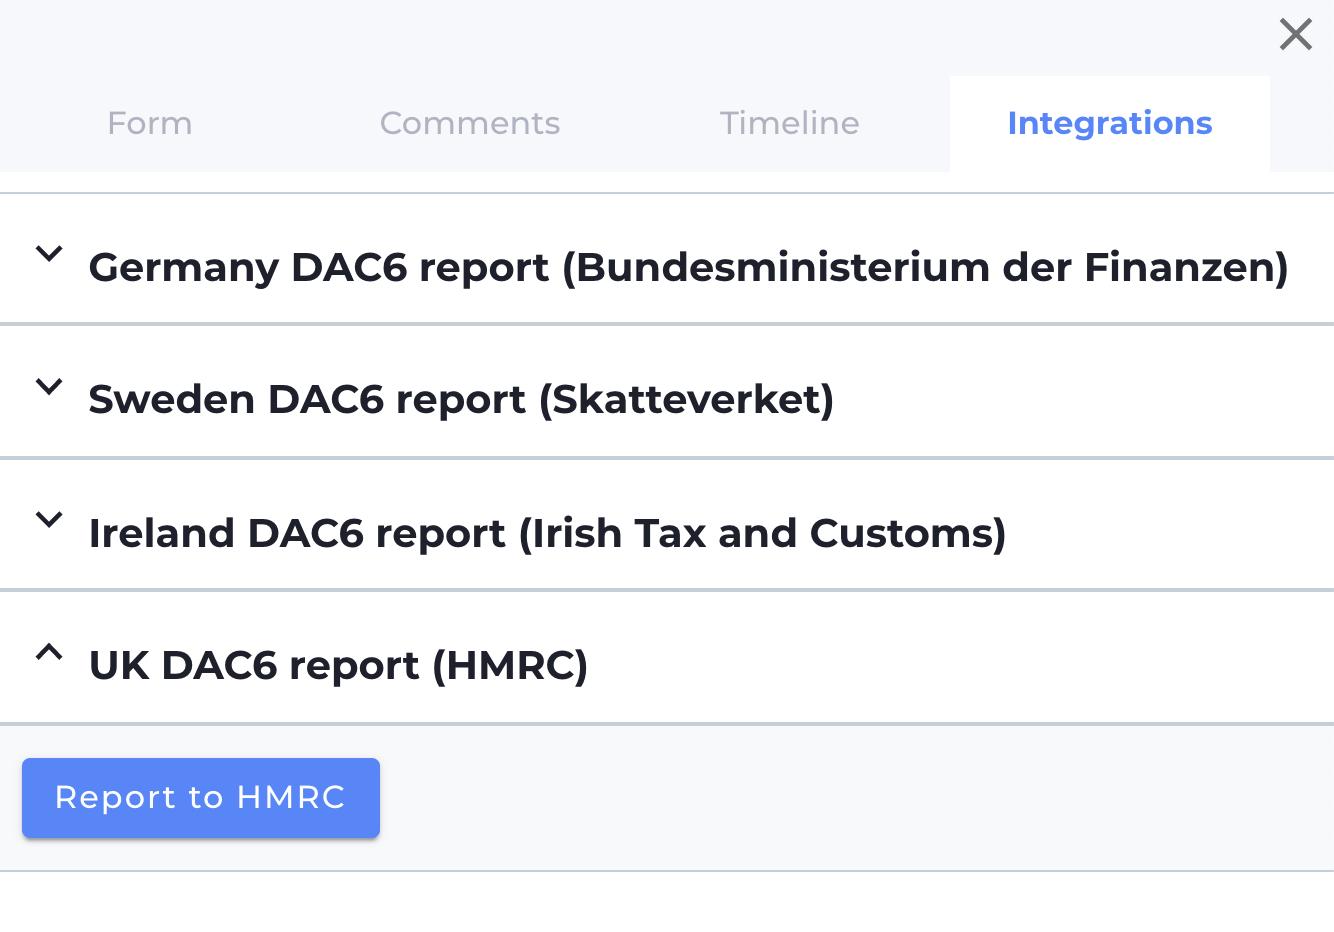 Reporting schemas